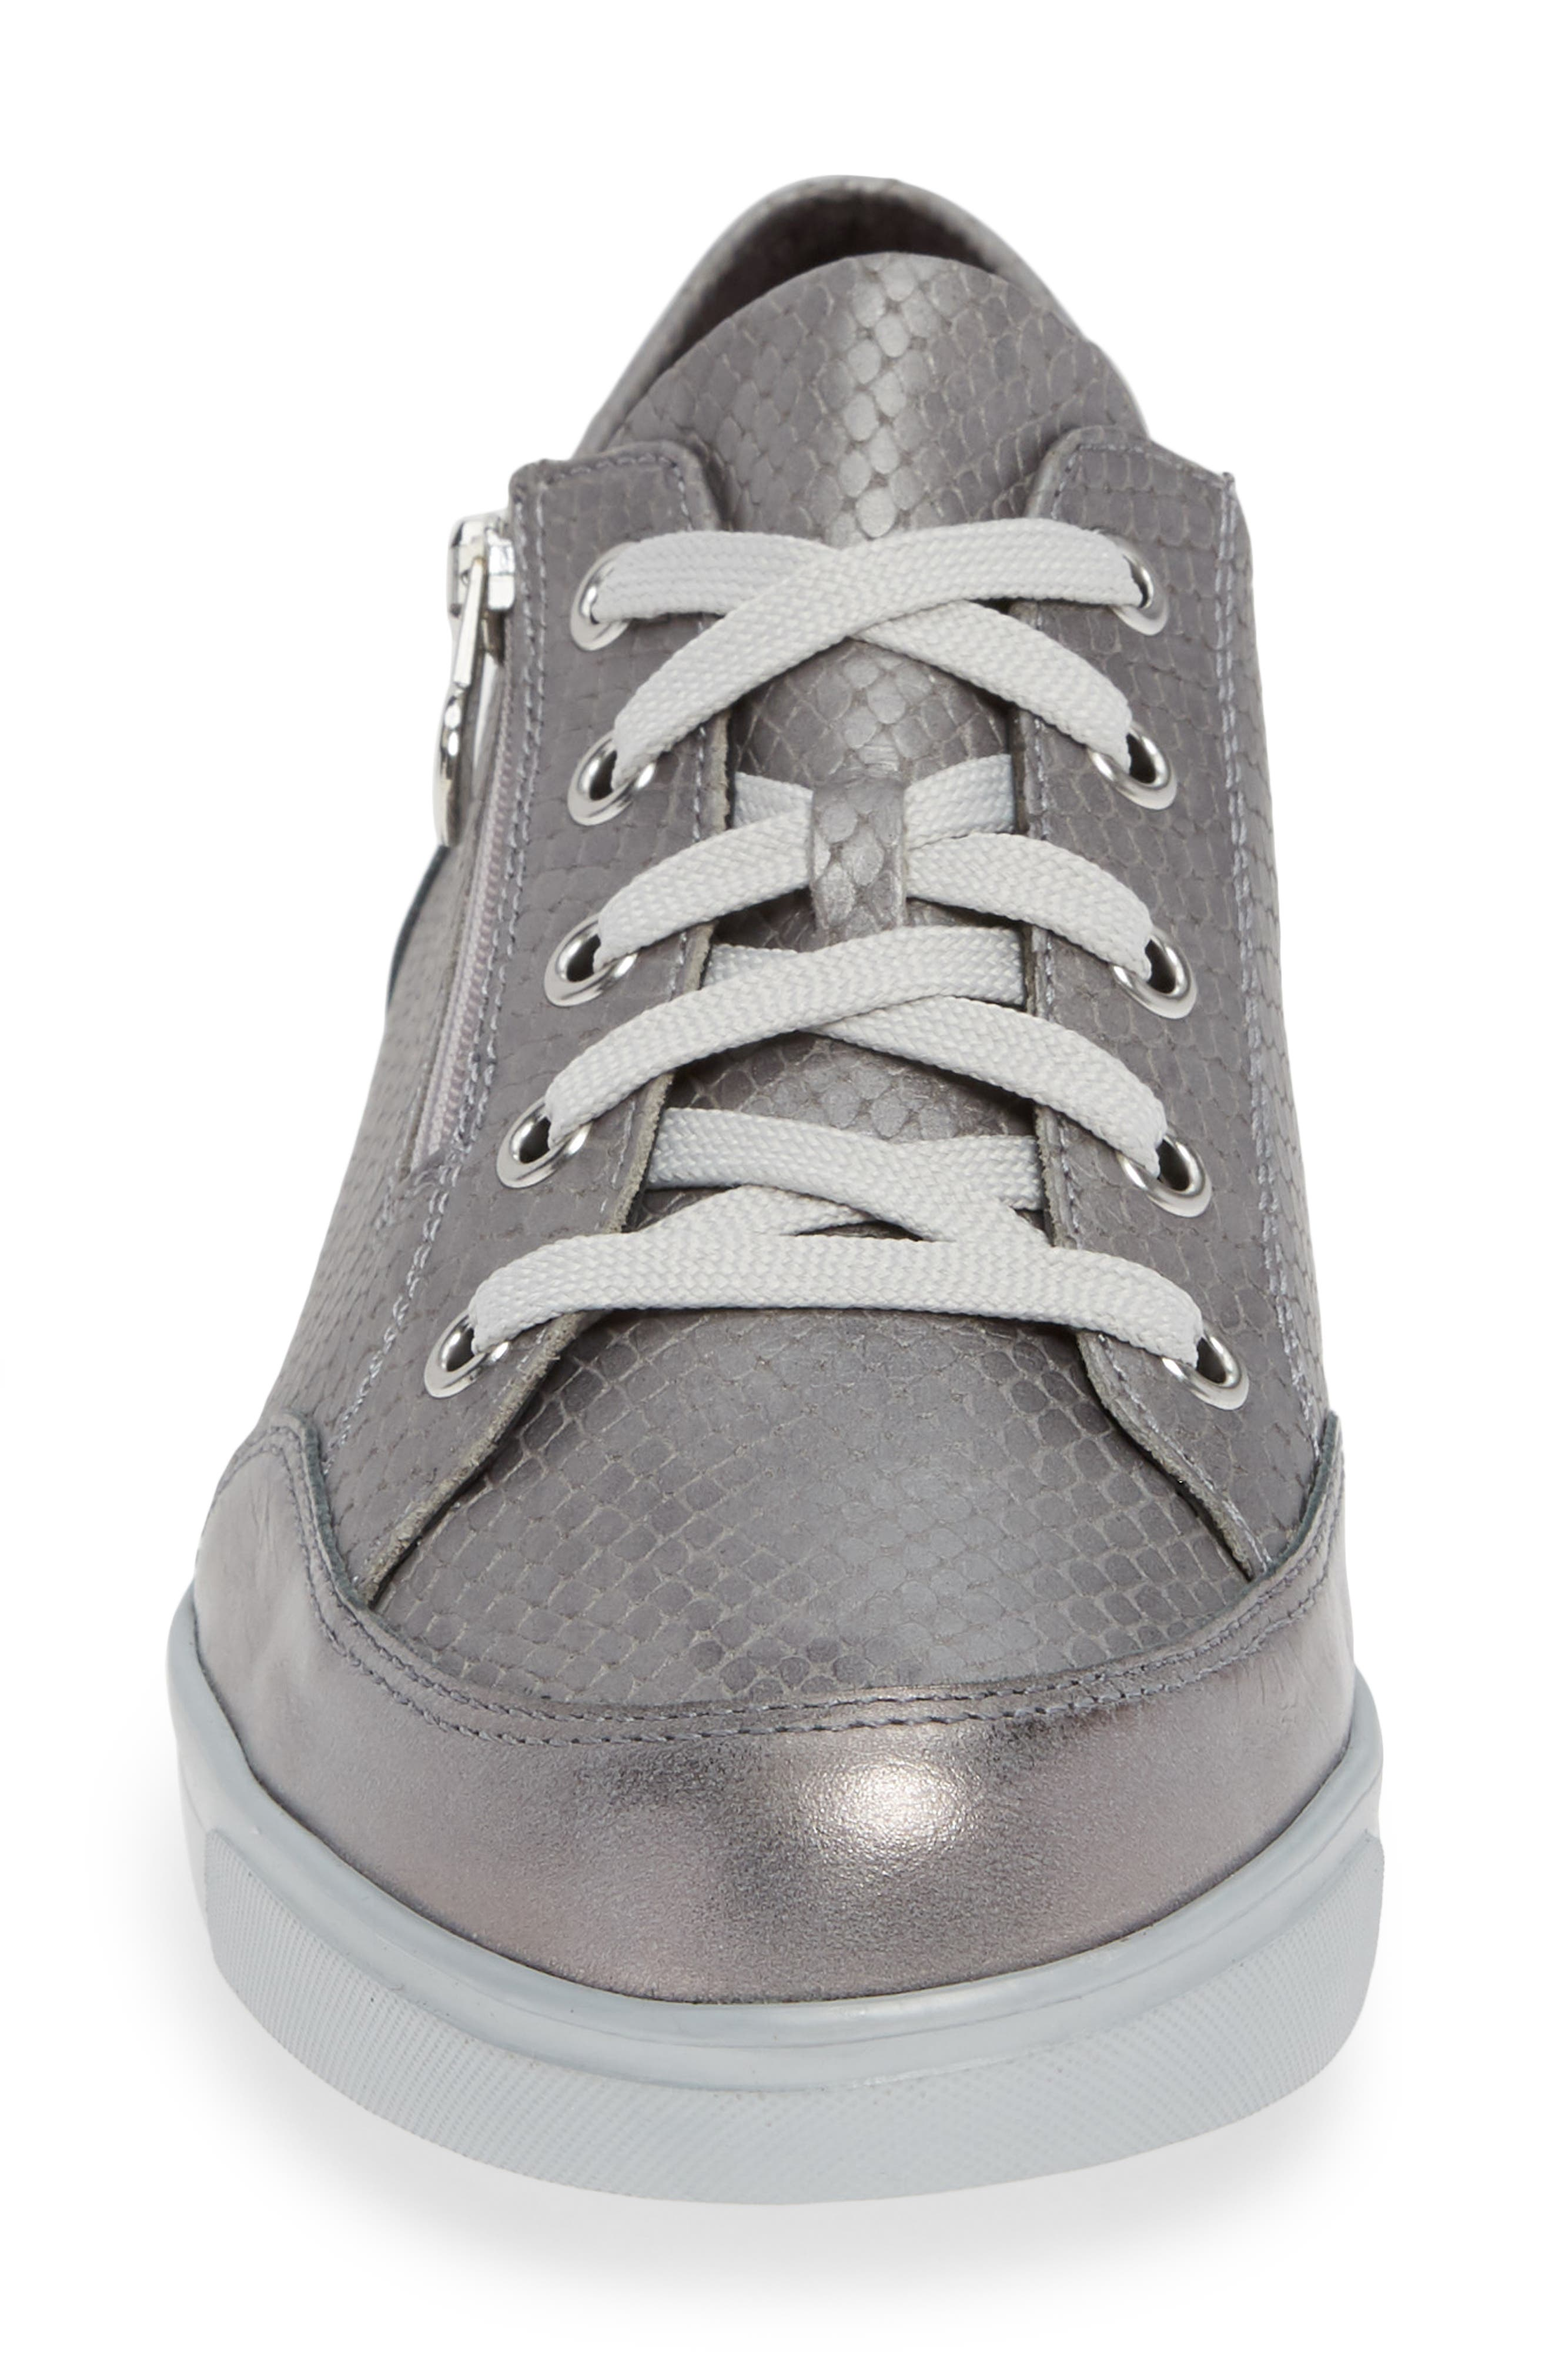 Gabbie Sneaker,                             Alternate thumbnail 4, color,                             LIGHT GREY LEATHER